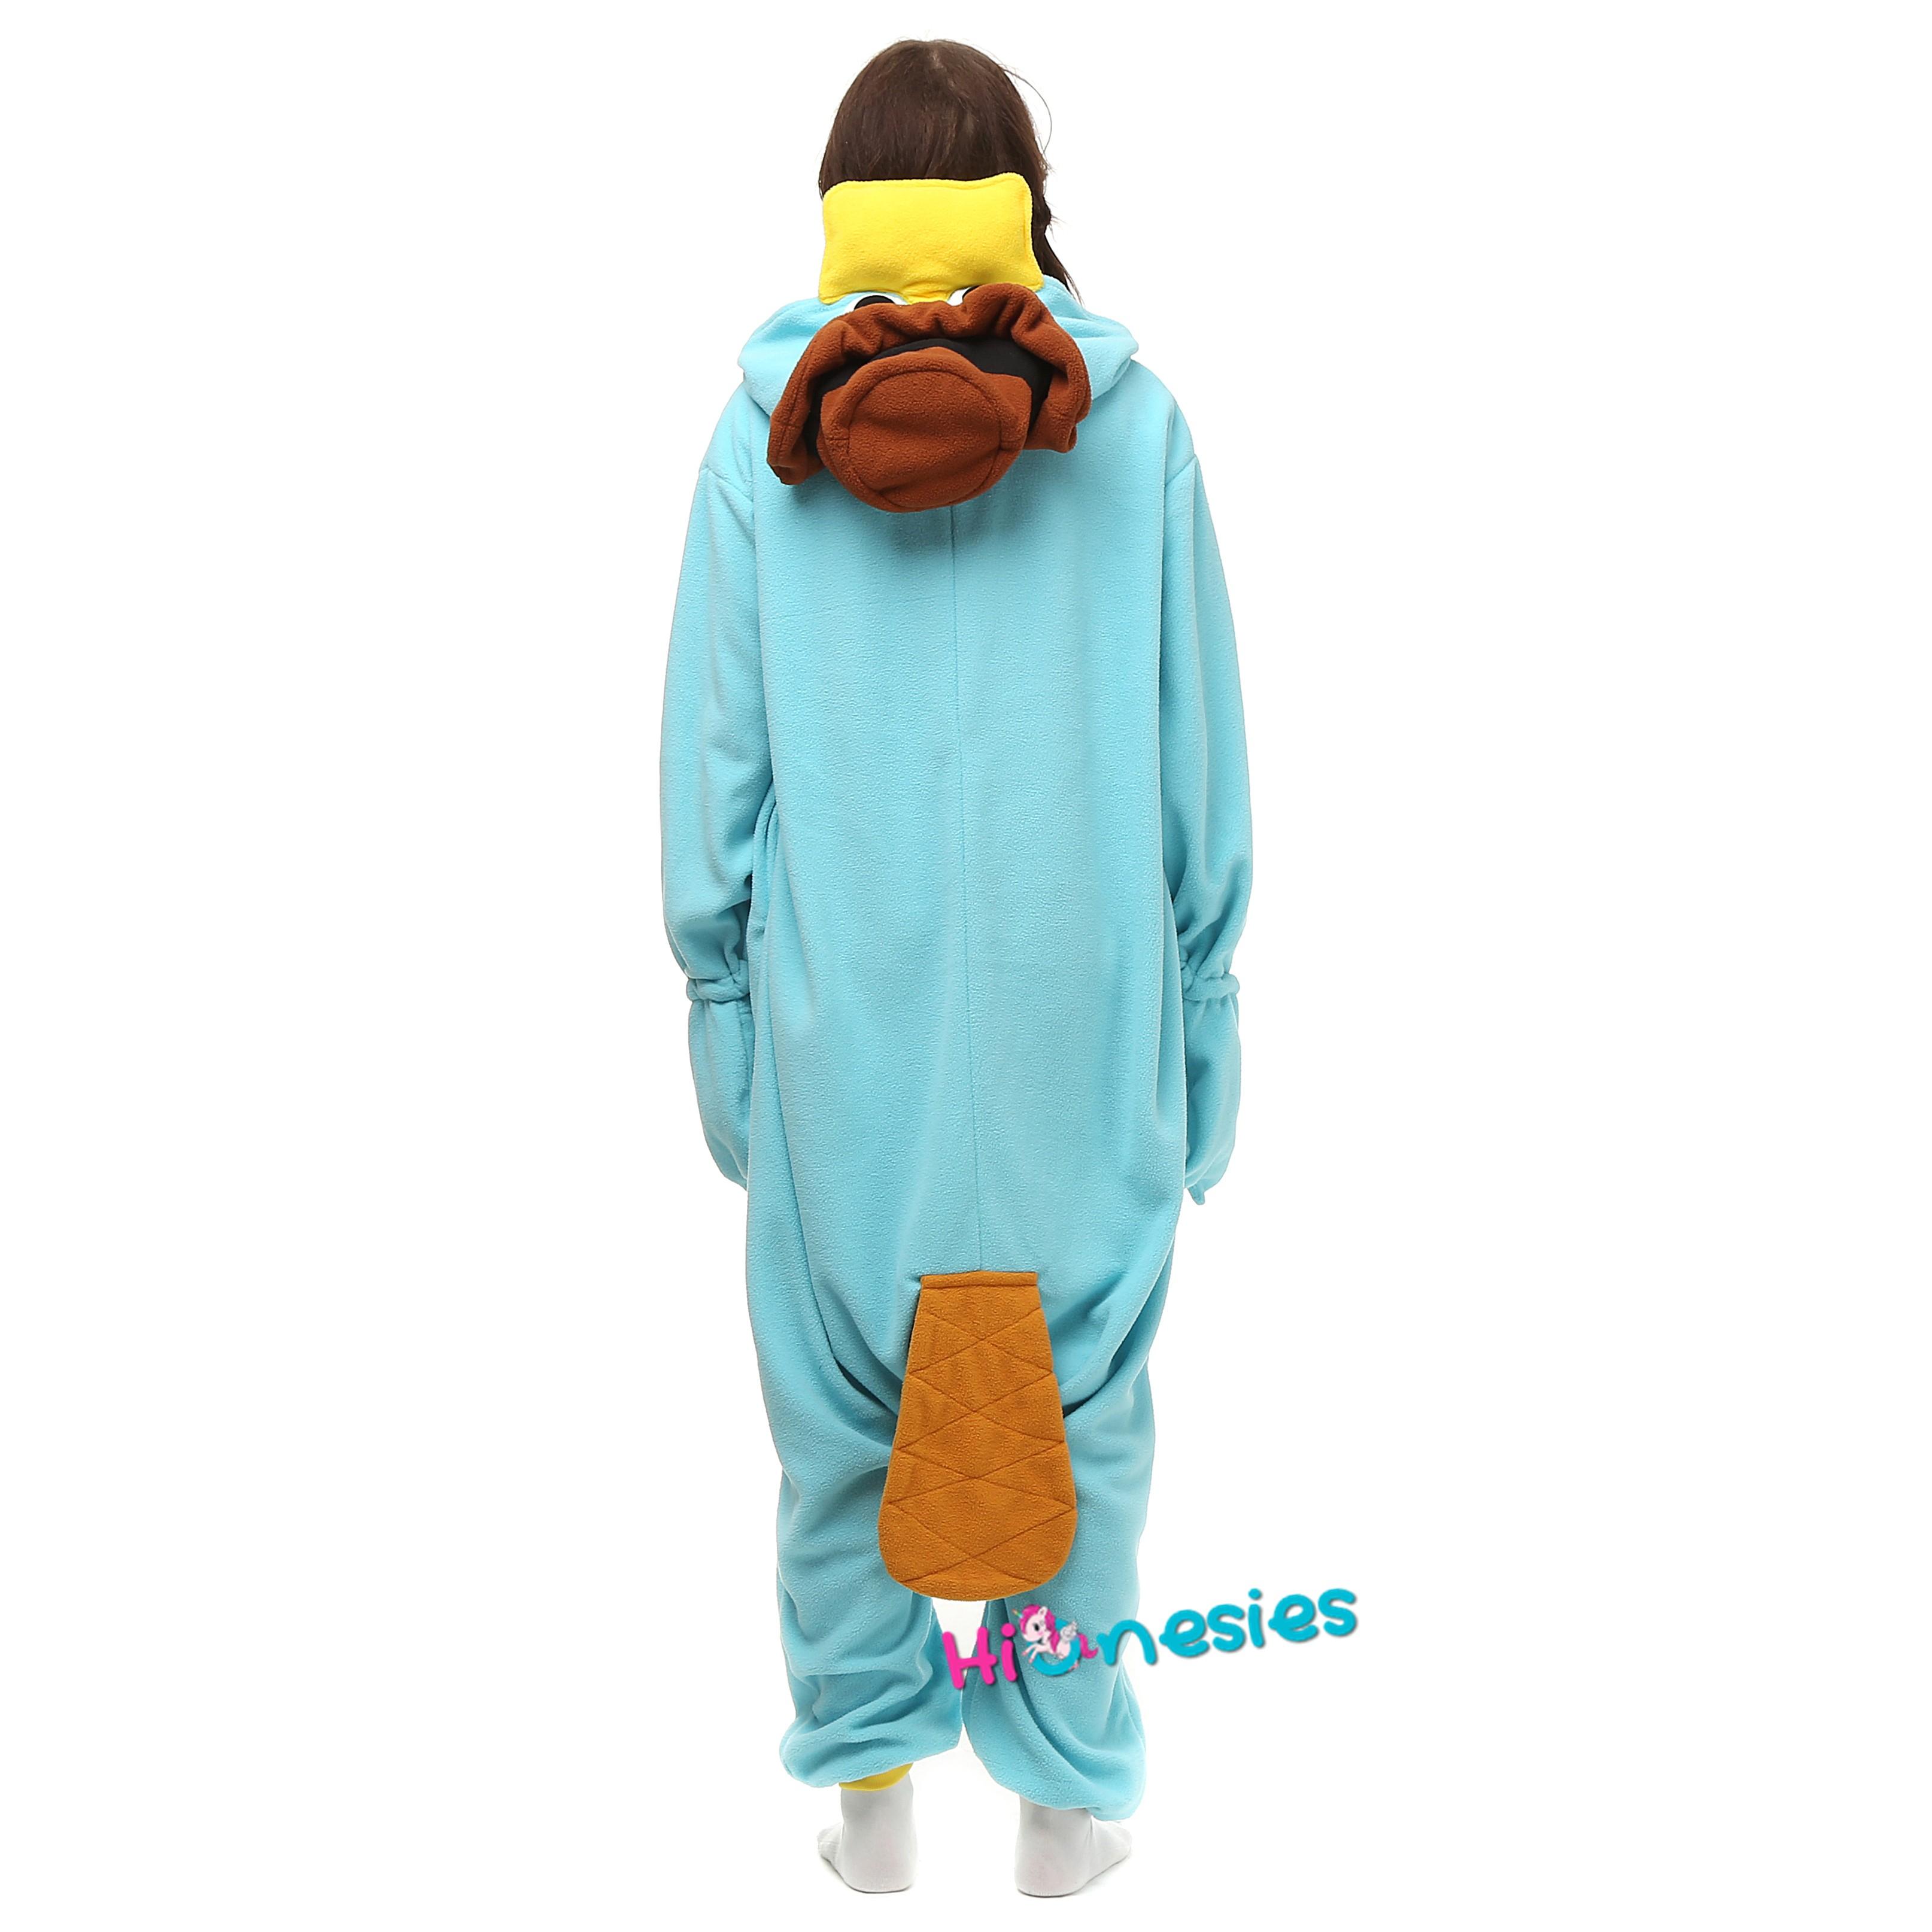 1ea371a16fac Perry the Platypus Onesie